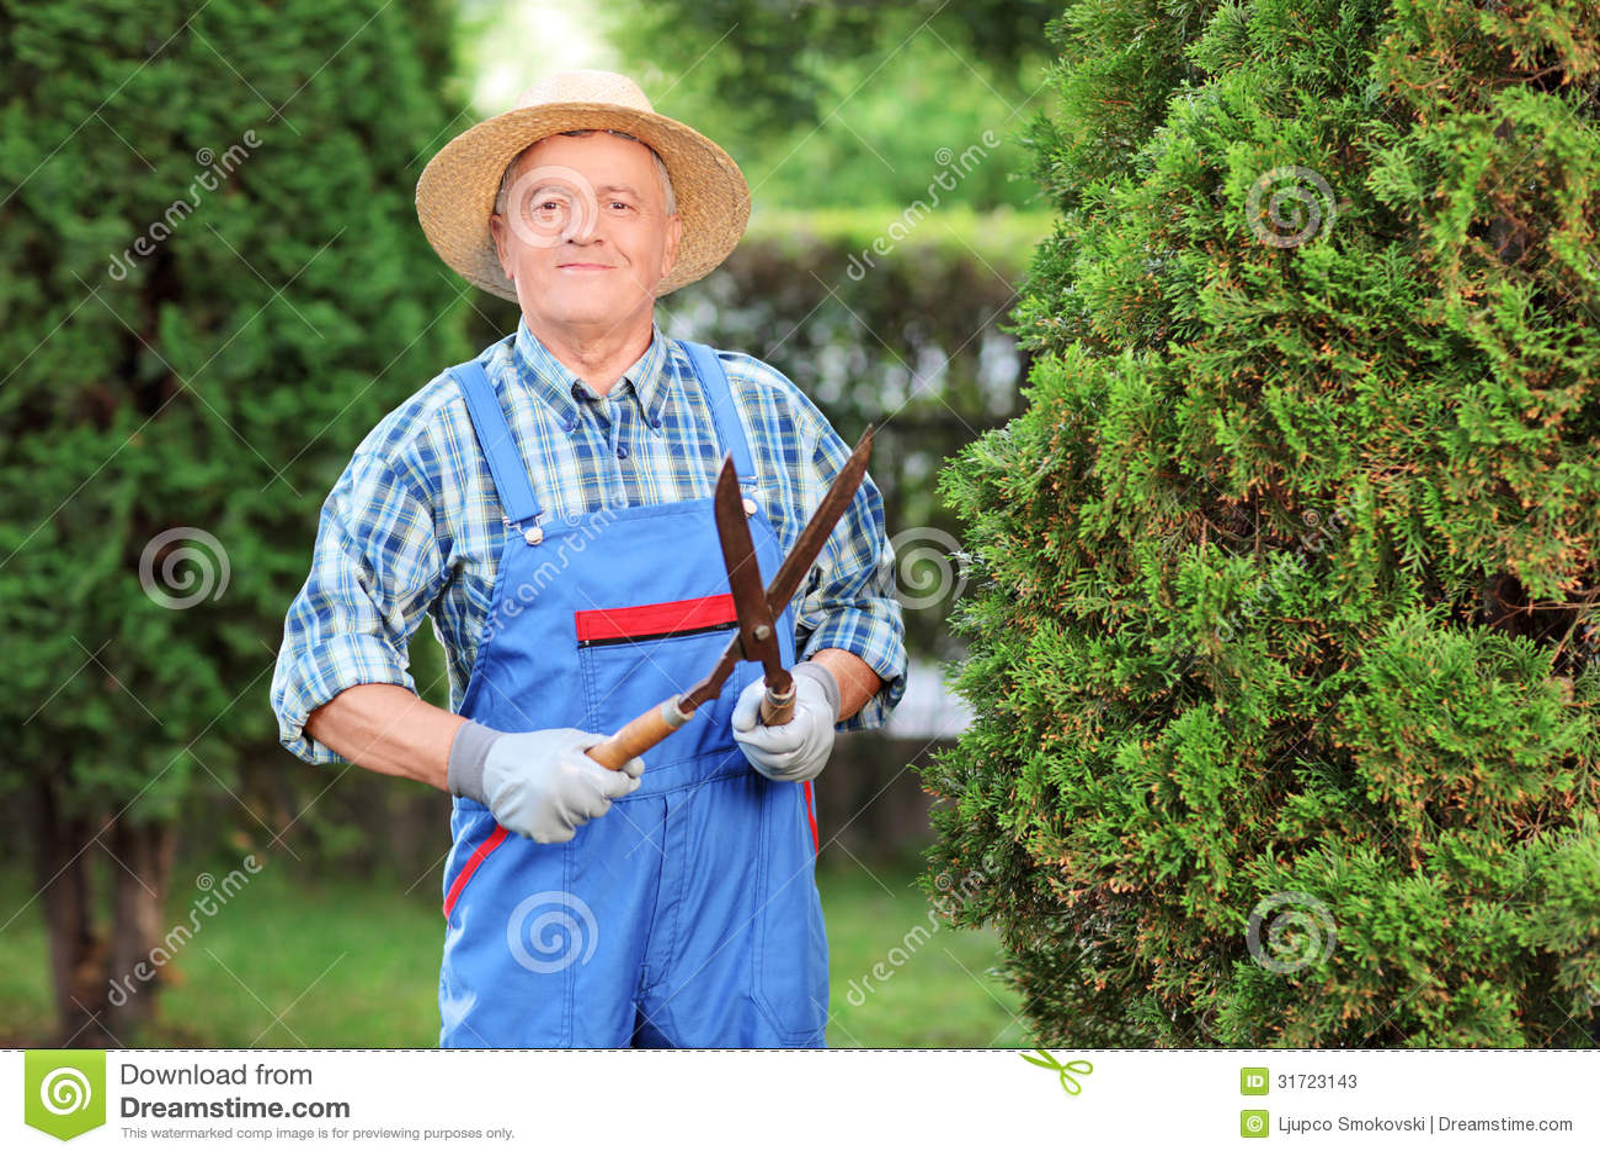 man trimming a fence in a garden stock photos image clip art clothes haper clip art clothes haper